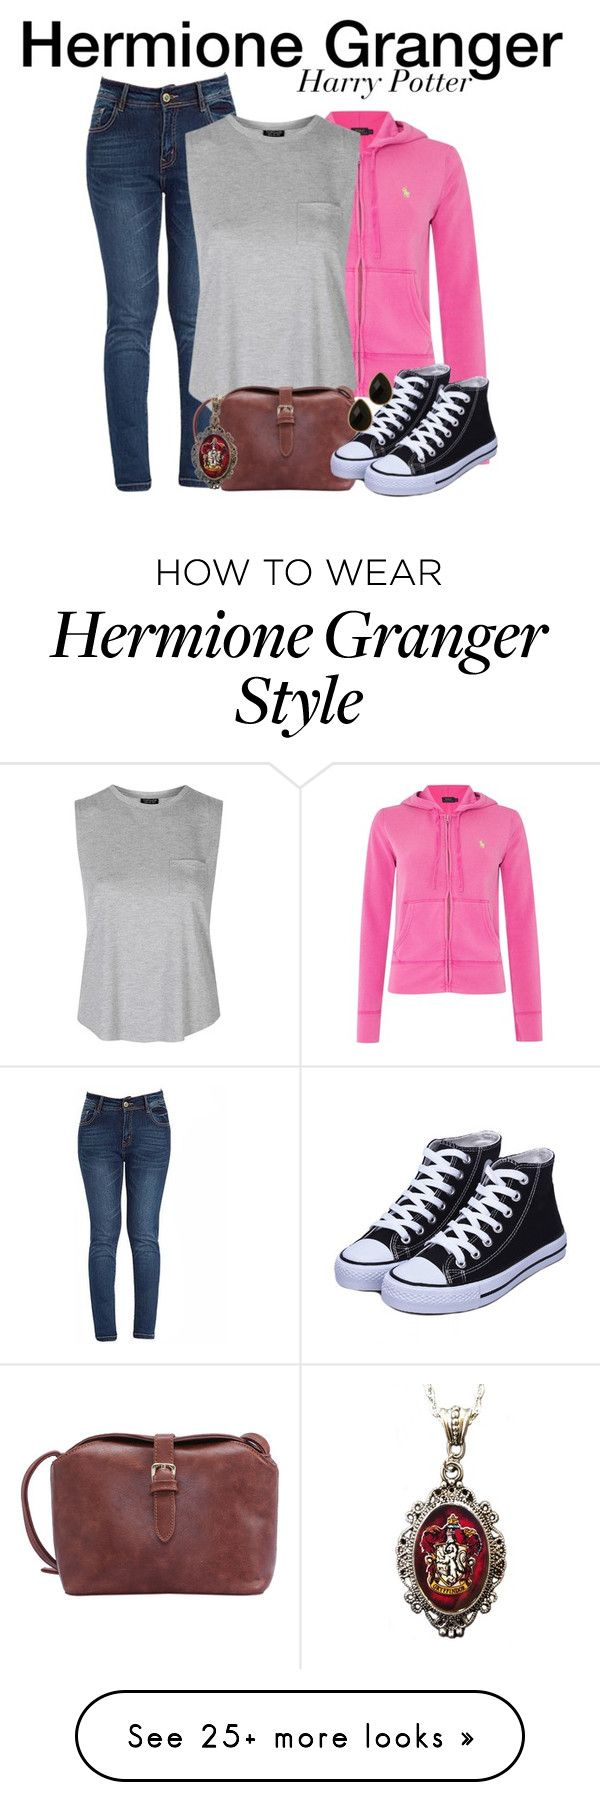 """Hermione Granger - Harry Potter"" by nerd-ville on Polyvore featuring Polo Ralph Lauren, Topshop, Alkemie, Natasha Accessories, women's clothing, women, female, woman, misses and juniors"